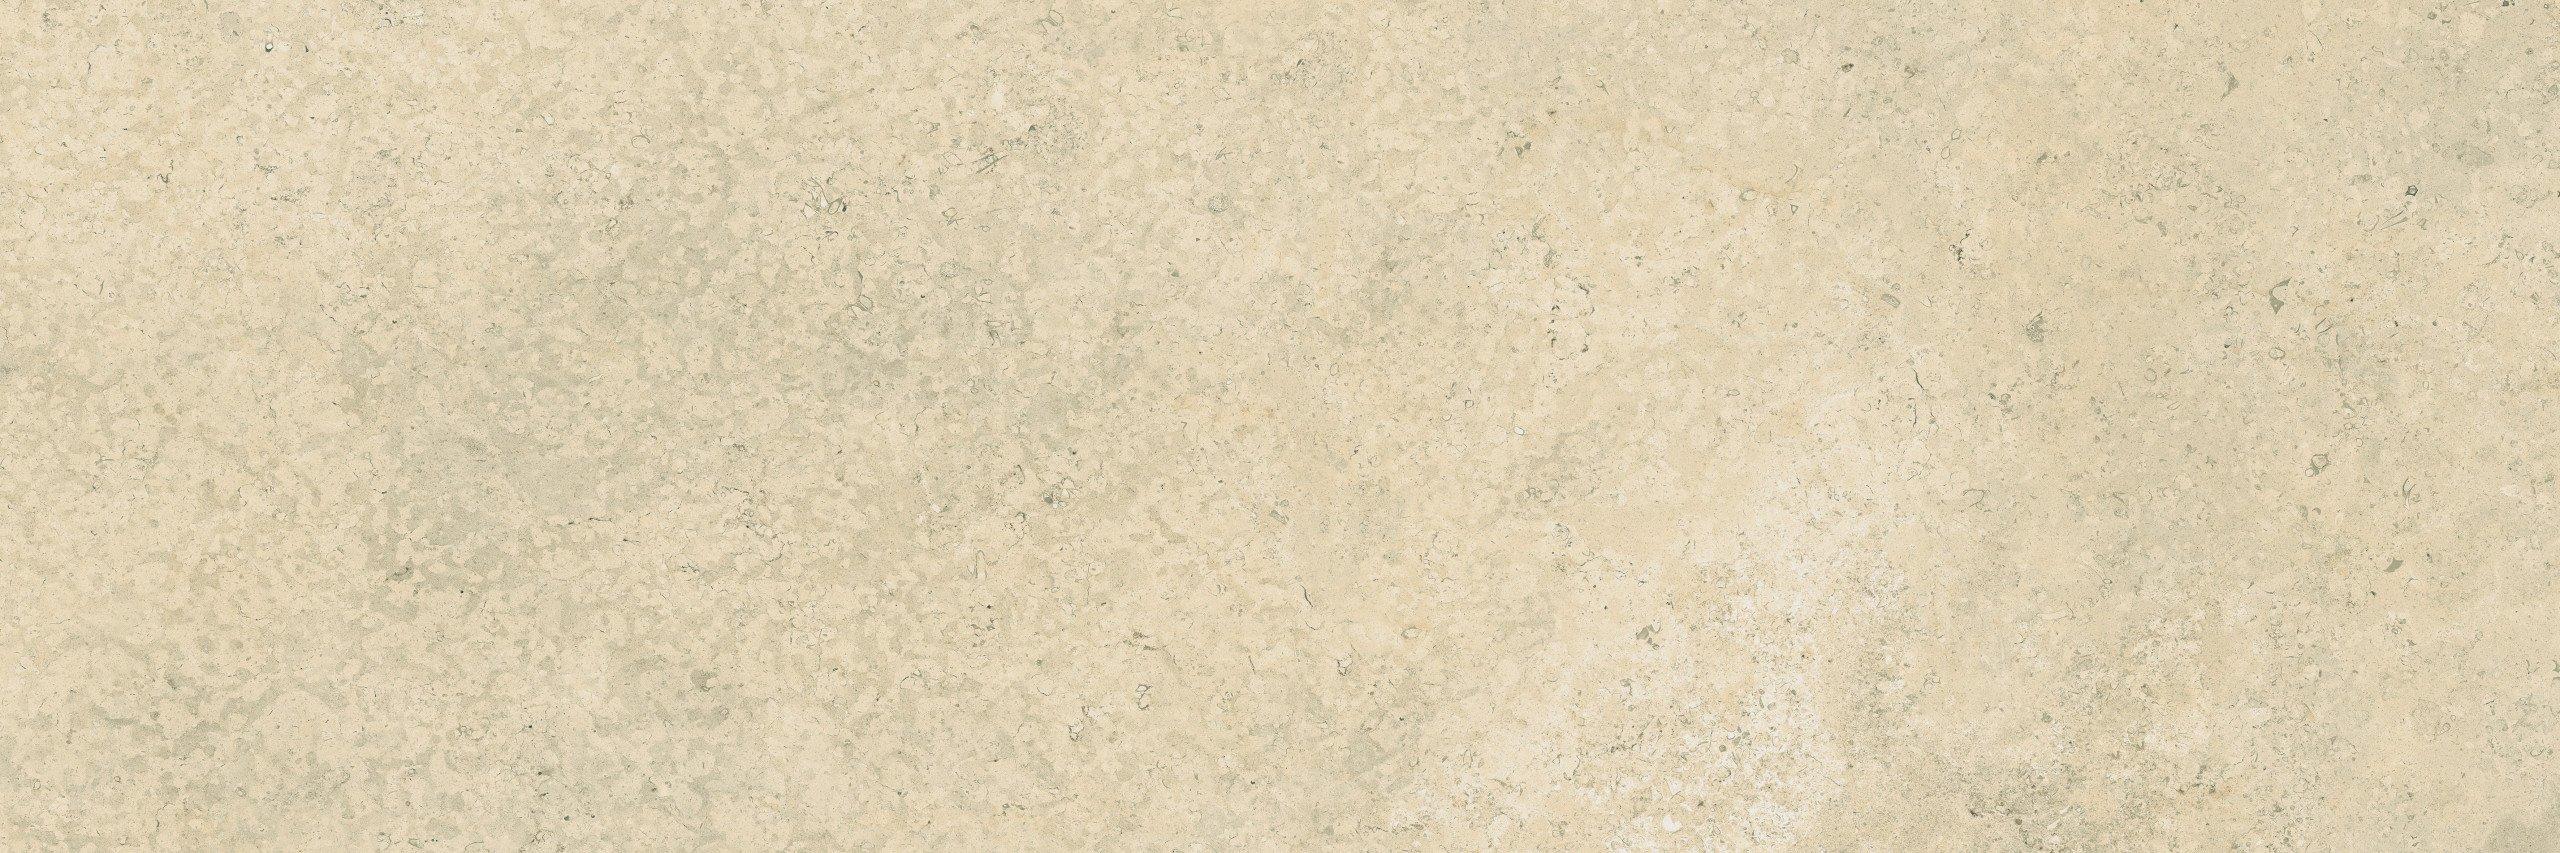 Silene Marmi Lunar Stone